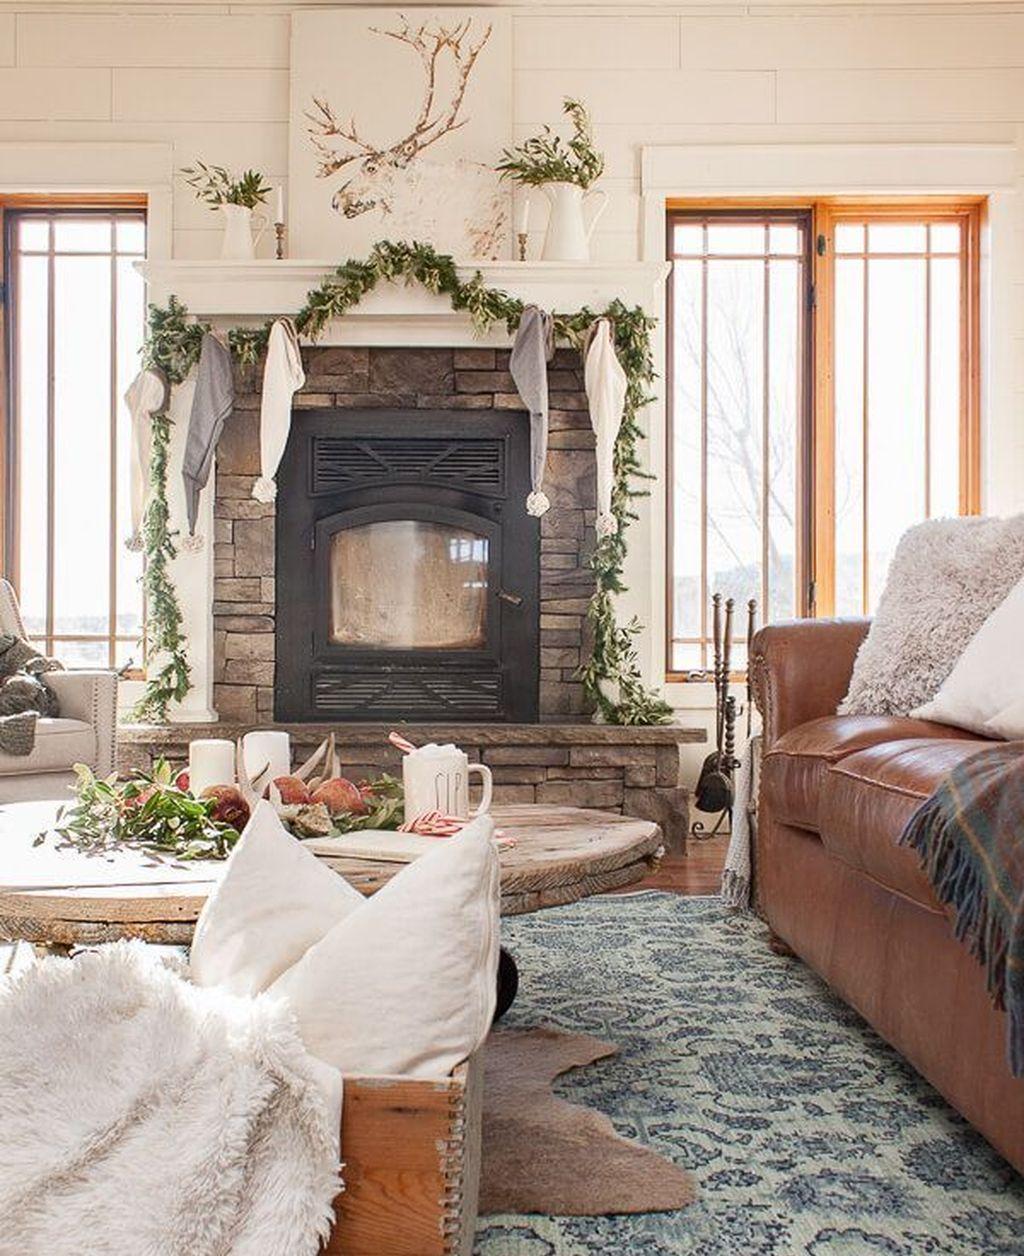 Enchanting Living Room Decor Ideas That Trending This Winter 05